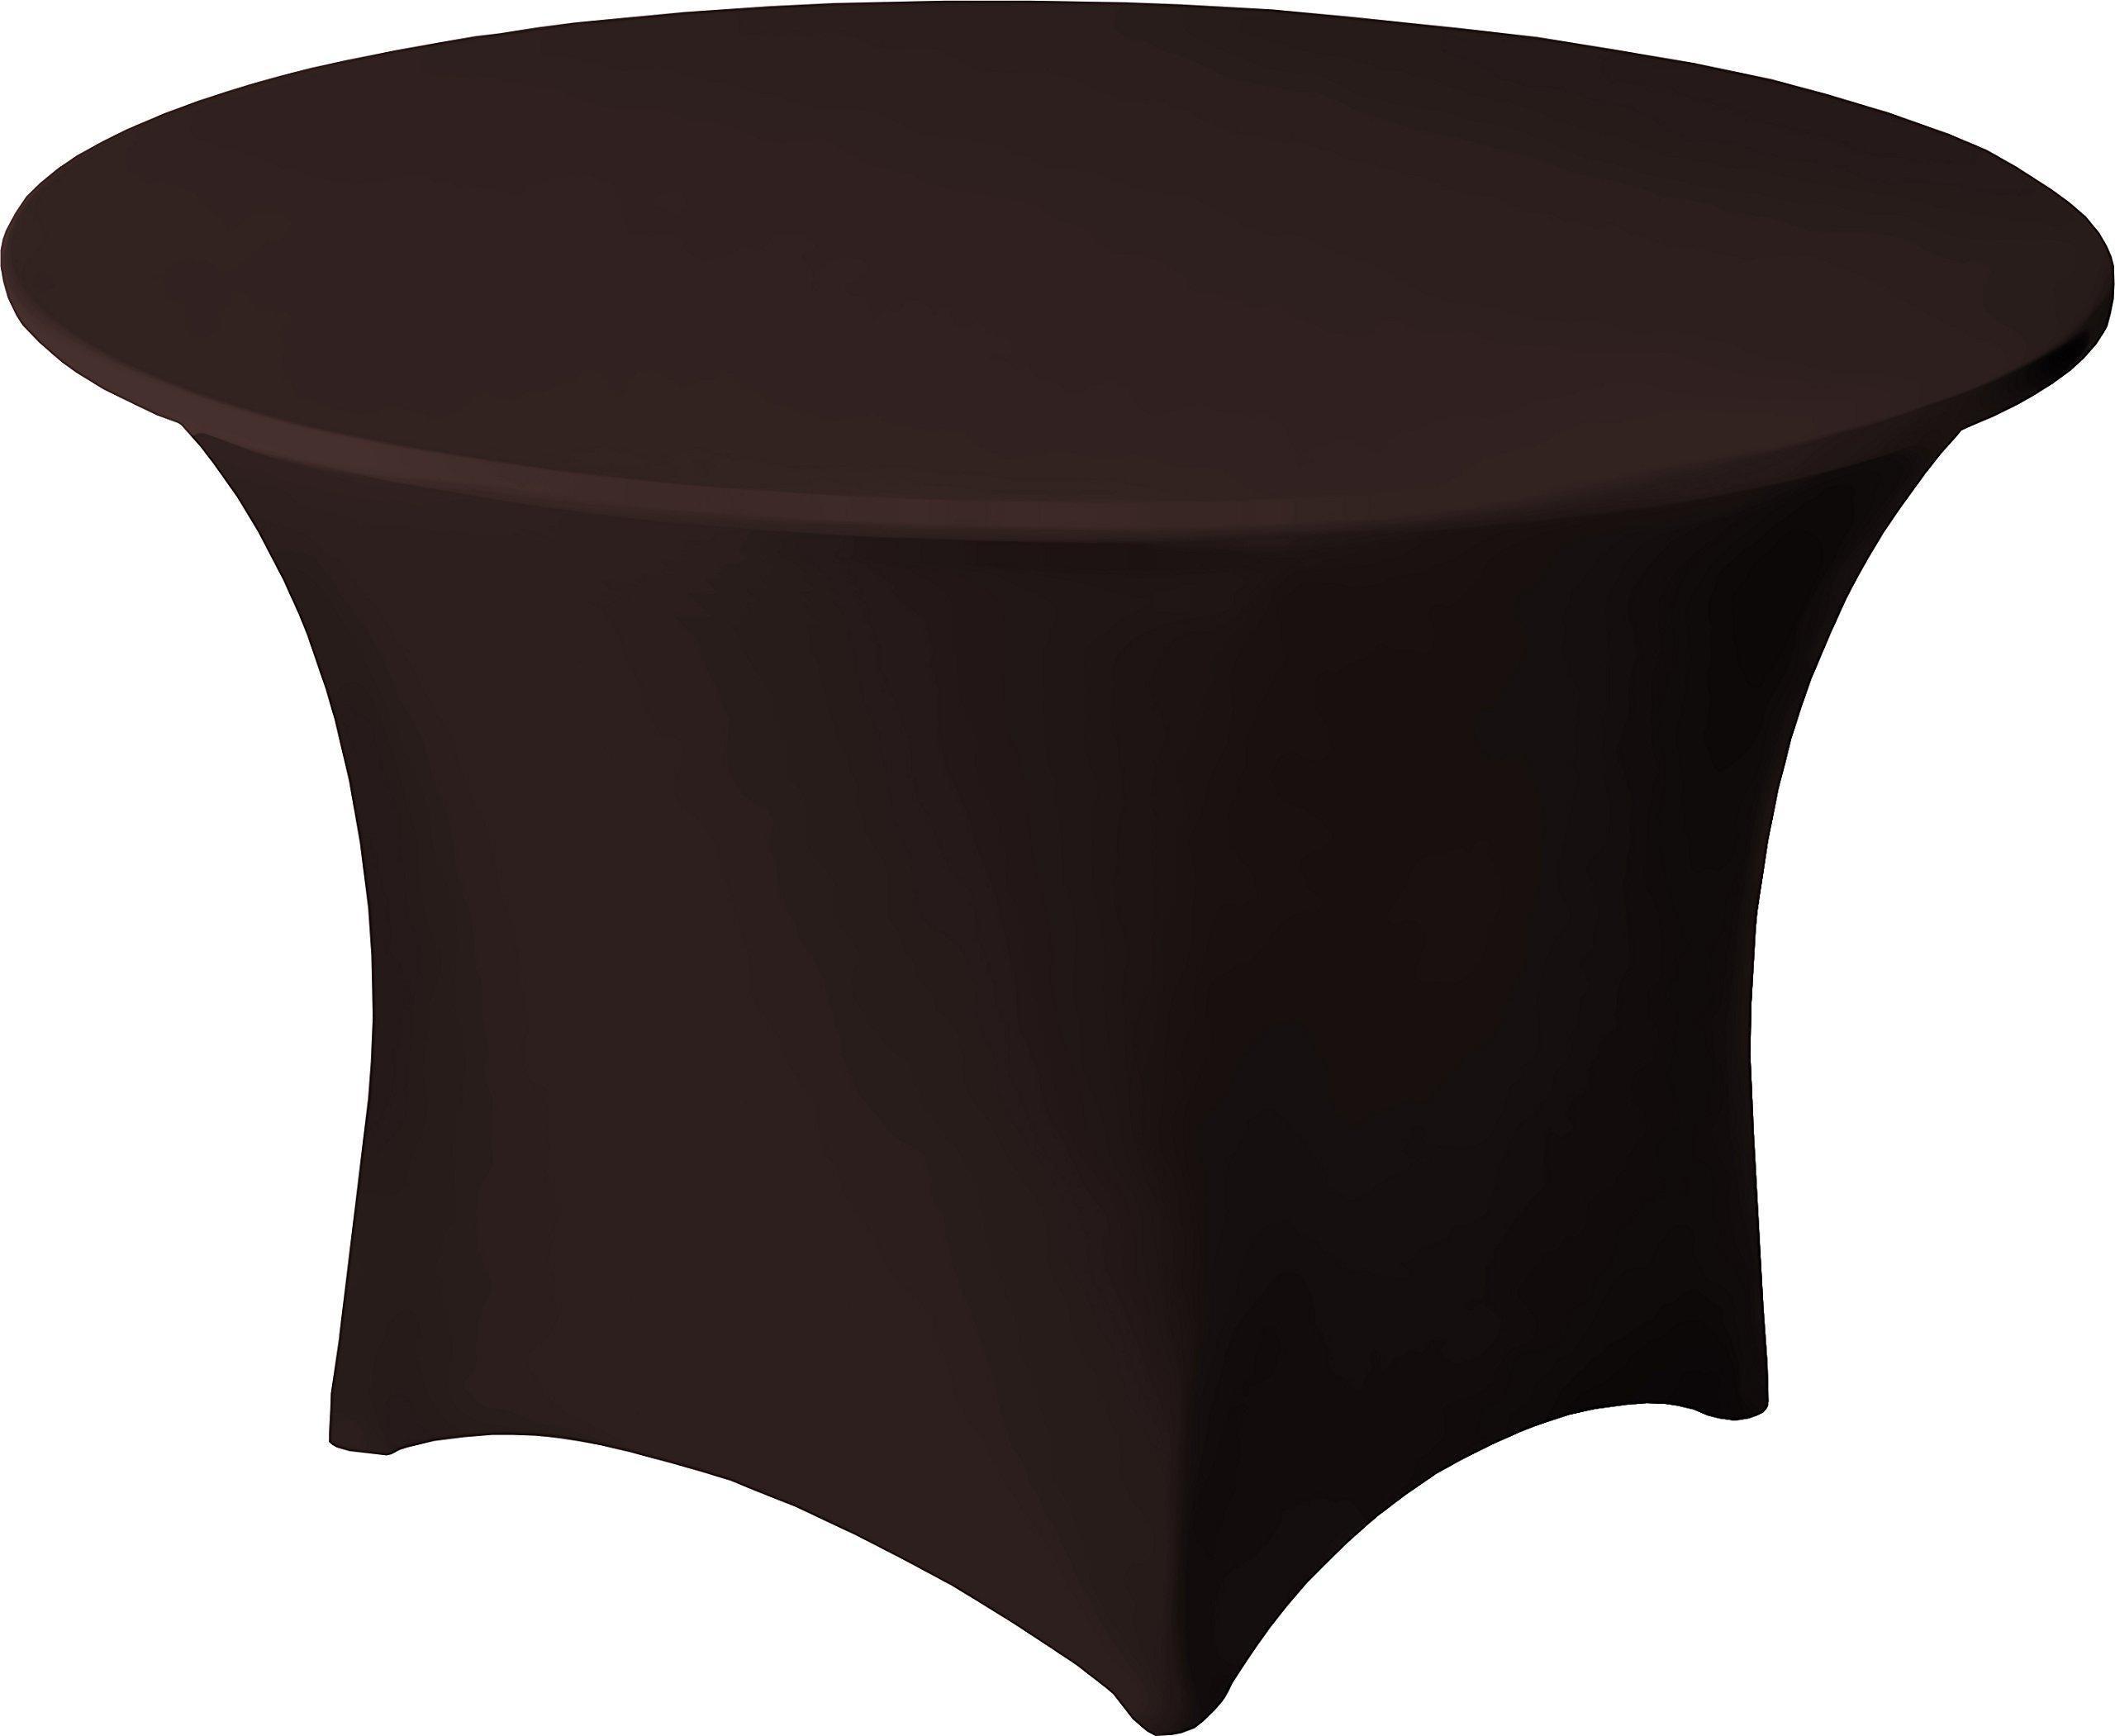 Snap Drape CC60RCHOC Contour Table Cover, Snug Fit, Reinforced Rubber Cup Attached To Leg, Flame Retardant, Machine Washable/Dryable, Fits 60